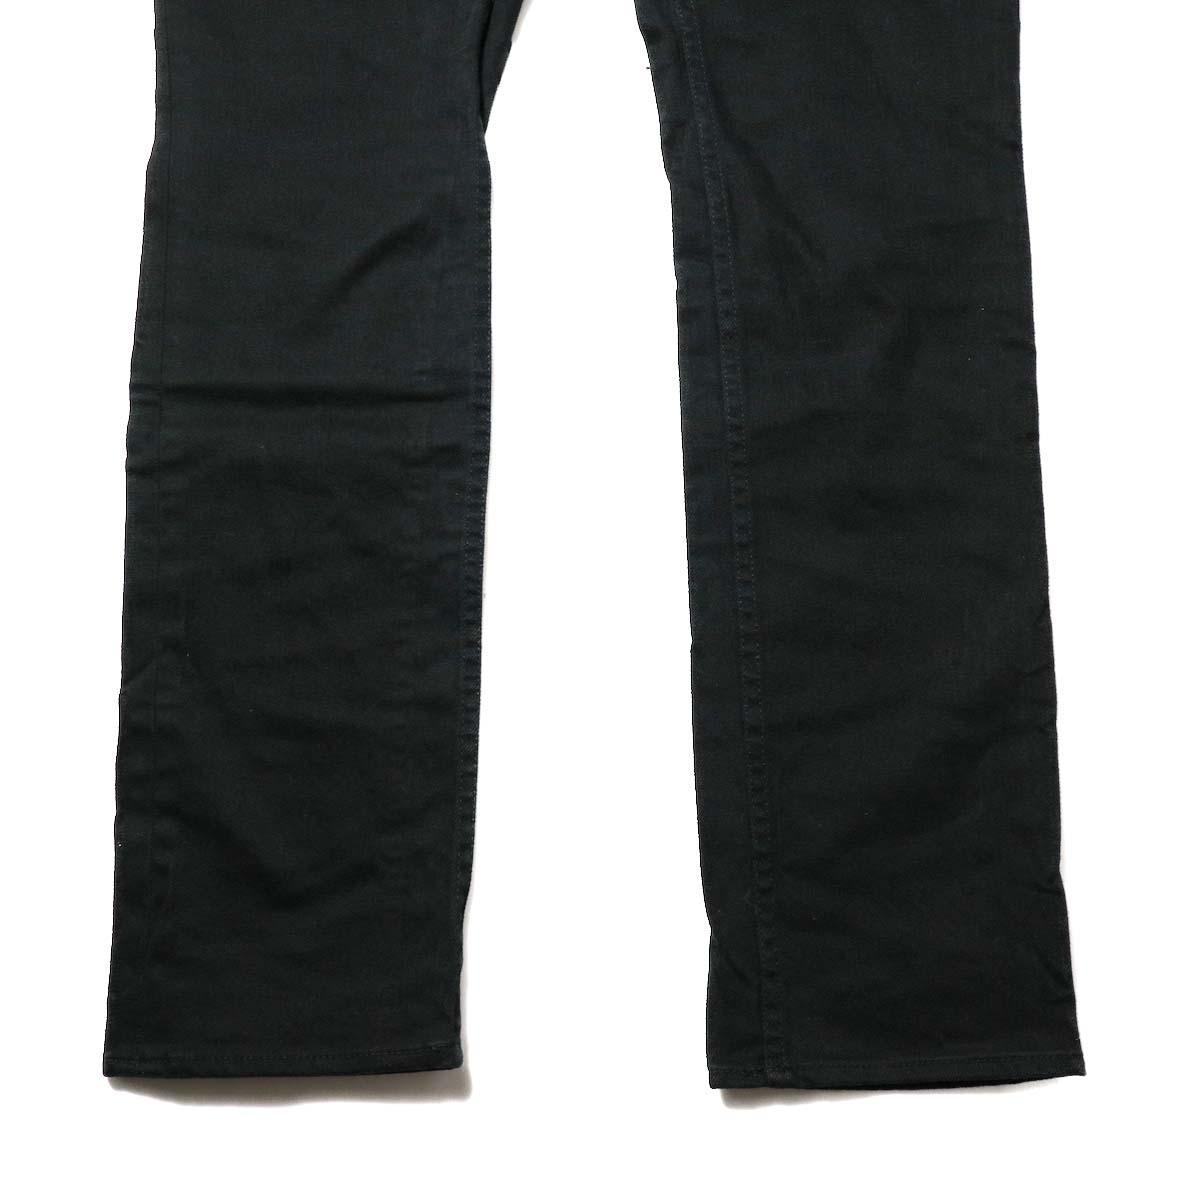 nonnative / DWELLER 5P JEANS DROPPED FIT C/P KATSURAGI STRETCH (Black)裾